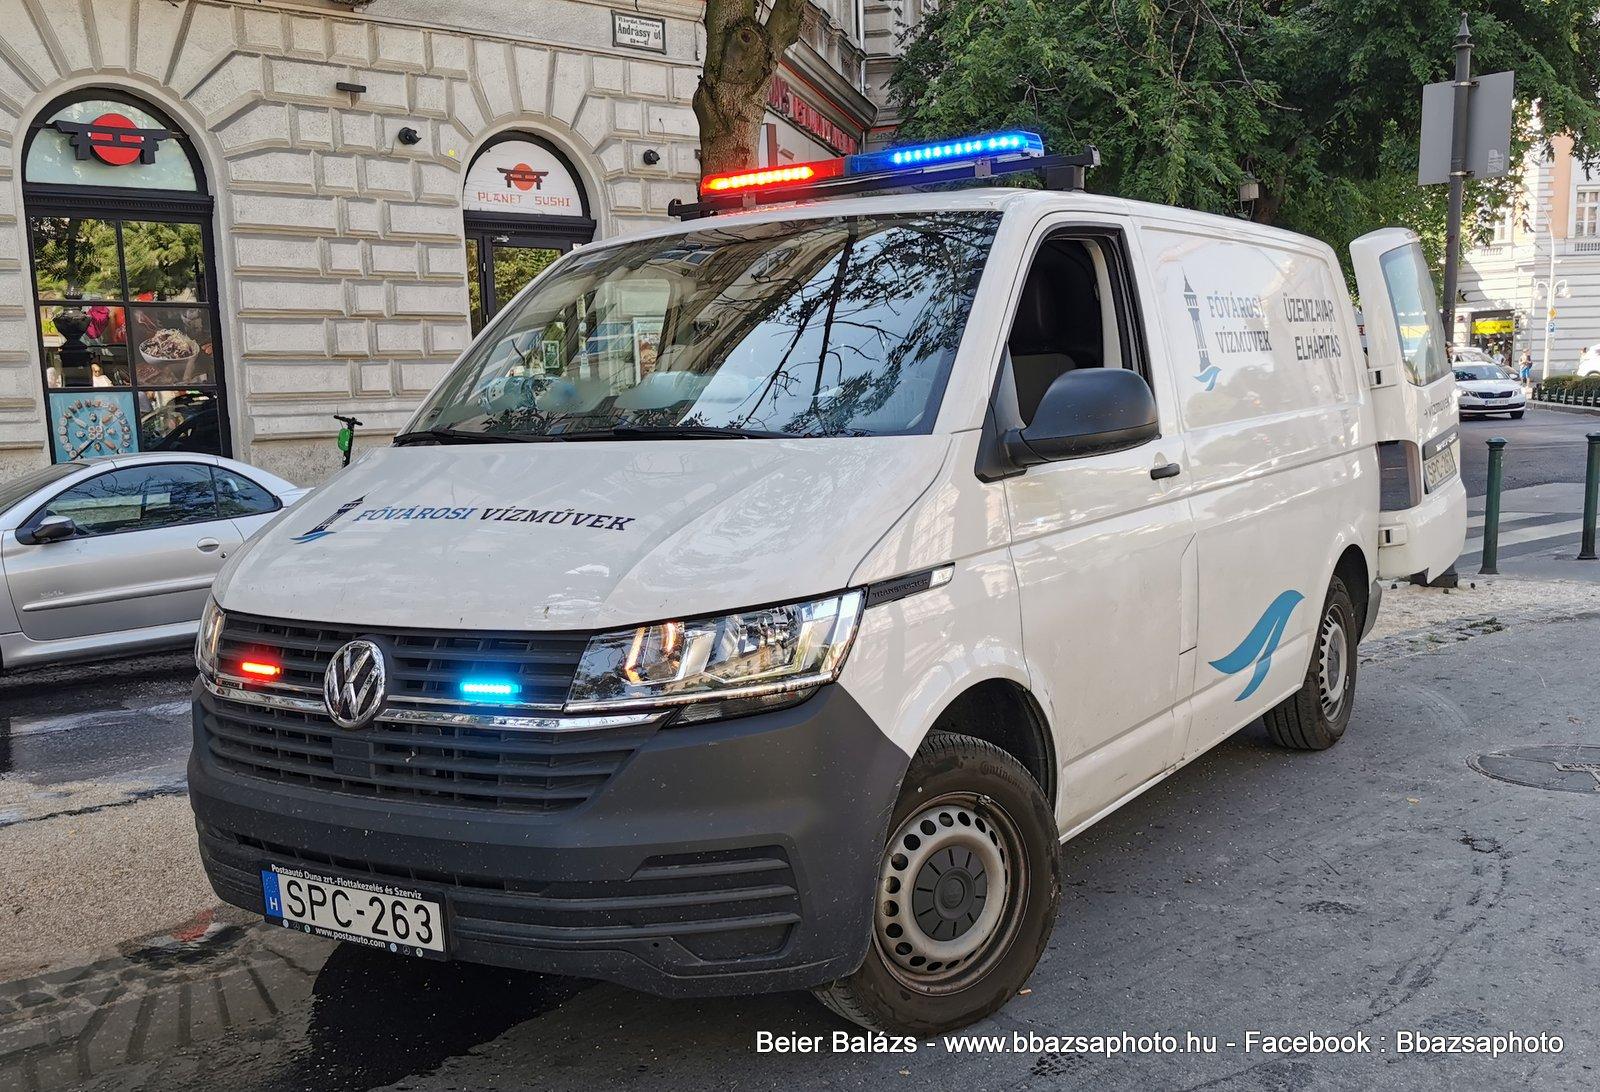 Volkswagen Transporter T6 led – Fővárosi Vízművek